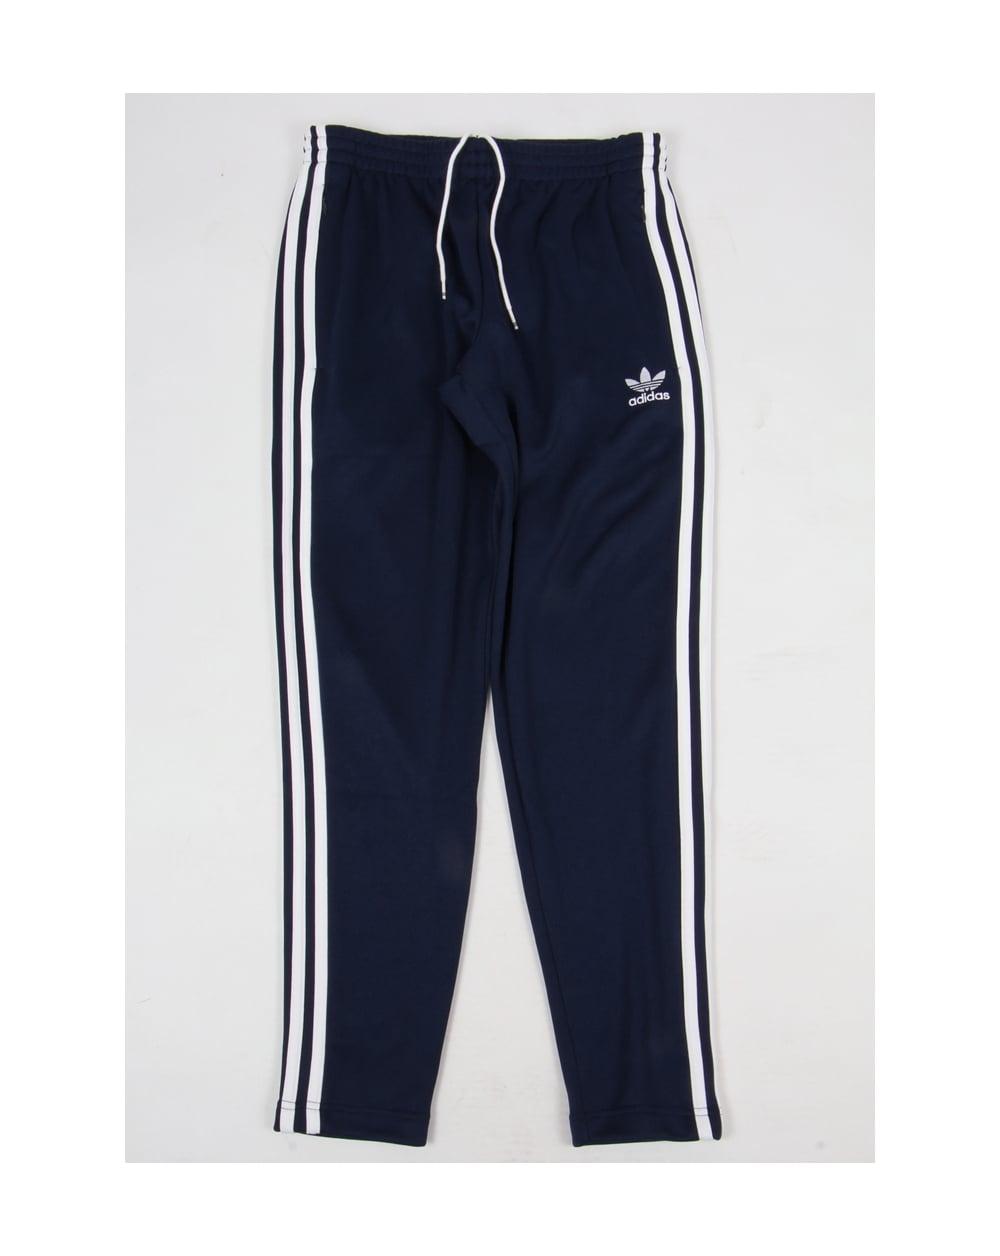 53ee01d1 Adidas Originals Superstar Open Hem Track Bottoms Navy/white